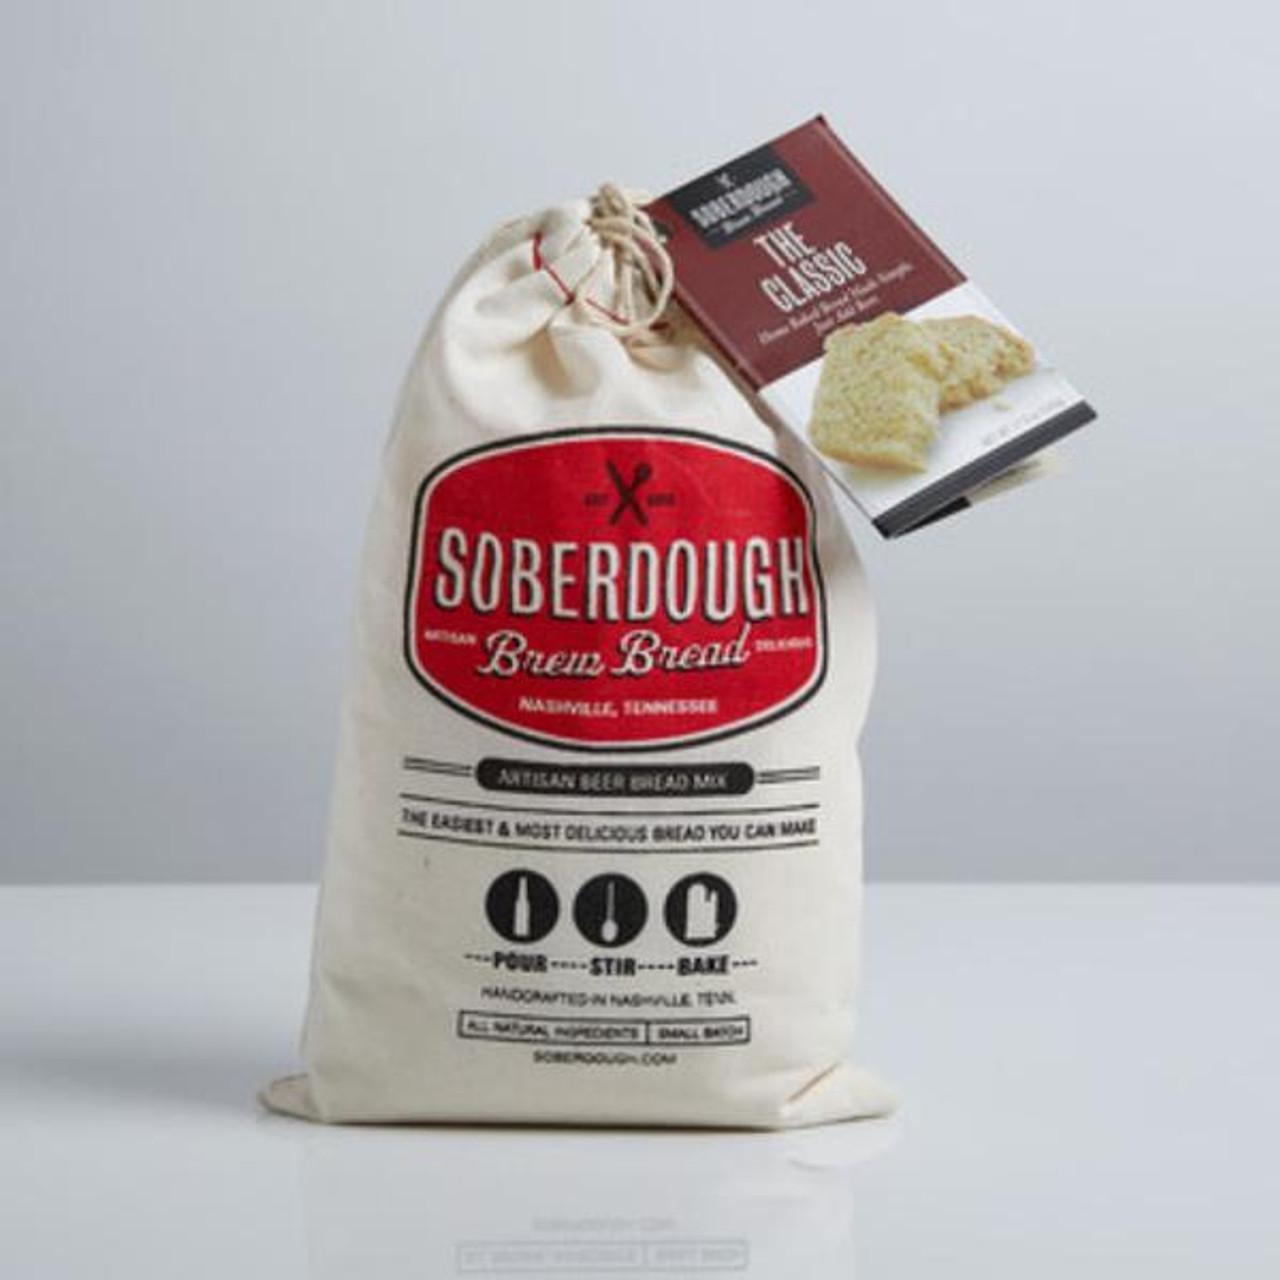 Soberdough classic beer bread